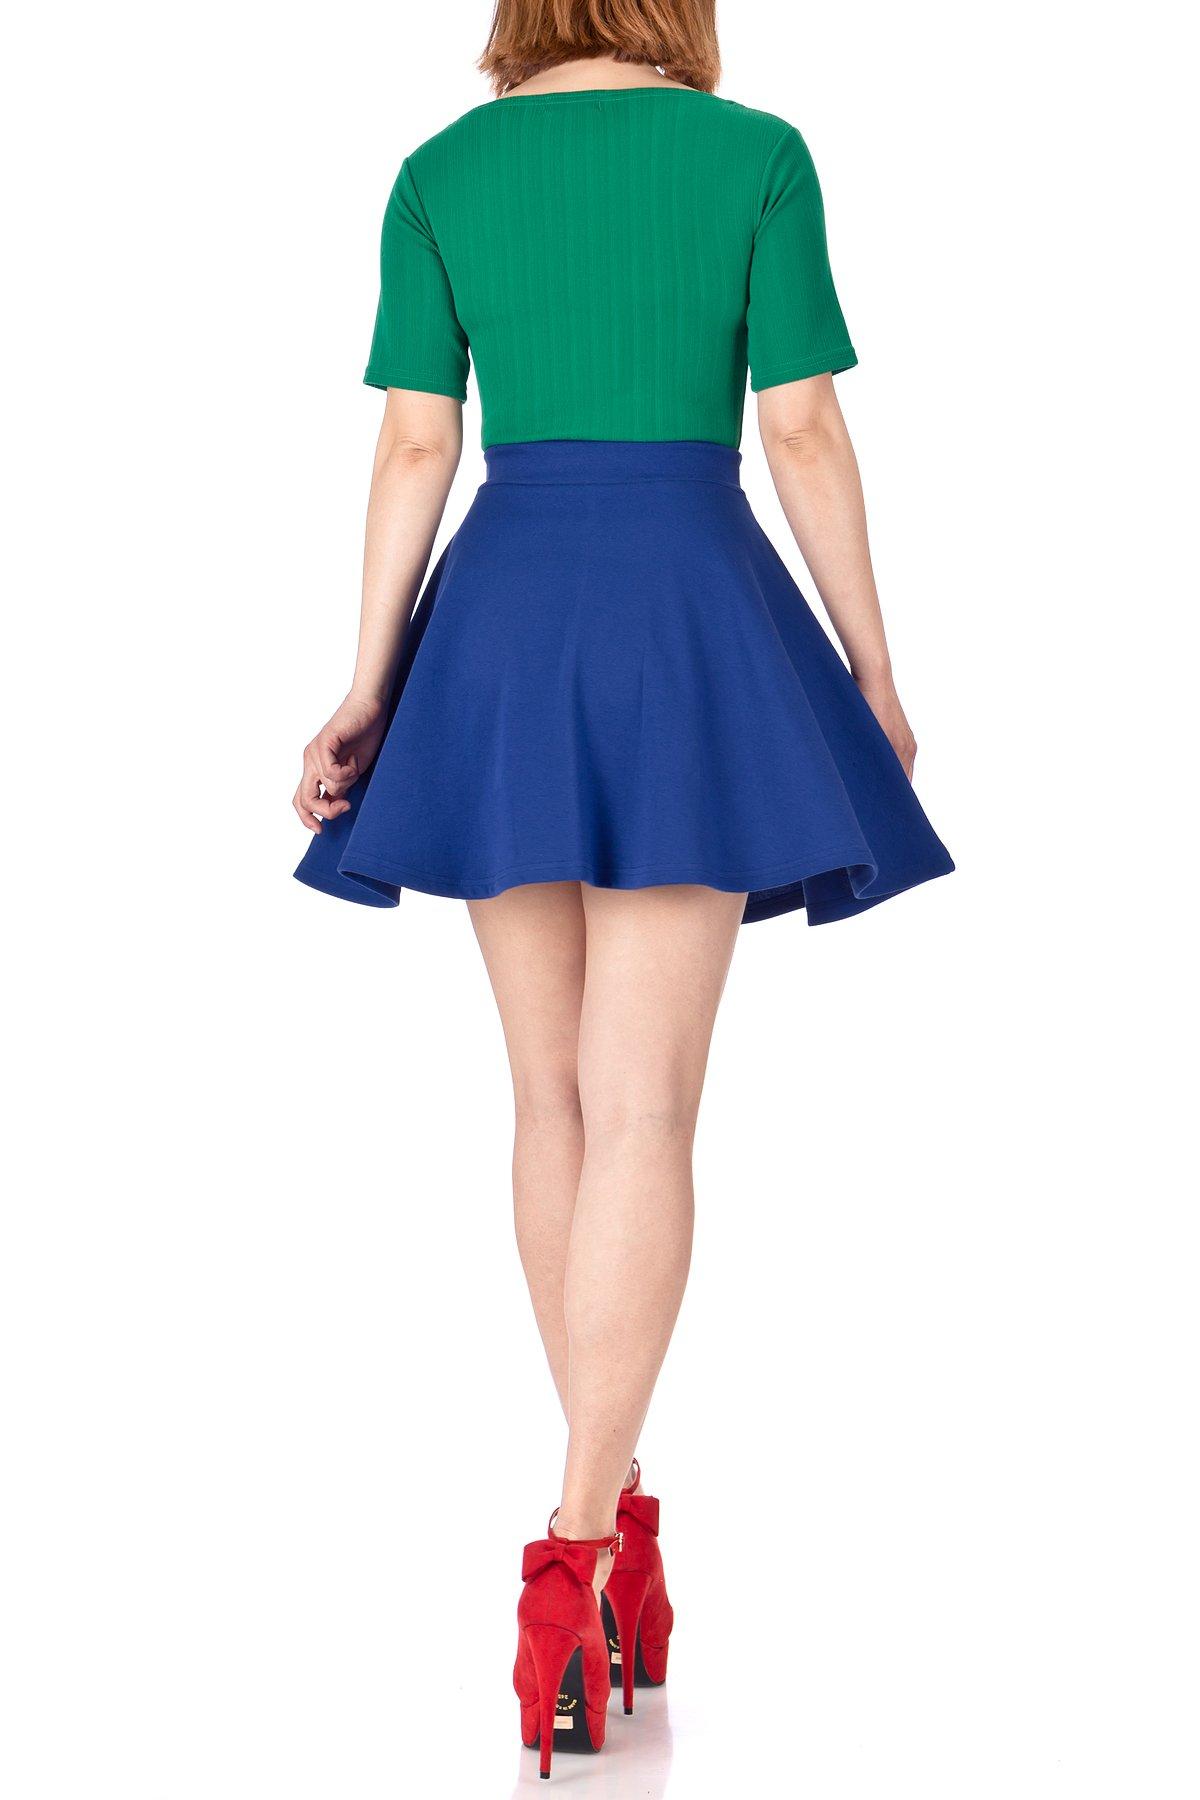 Basic Solid Stretchy Cotton High Waist A-line Flared Skater Mini Skirt (XL, Cobalt Blue)